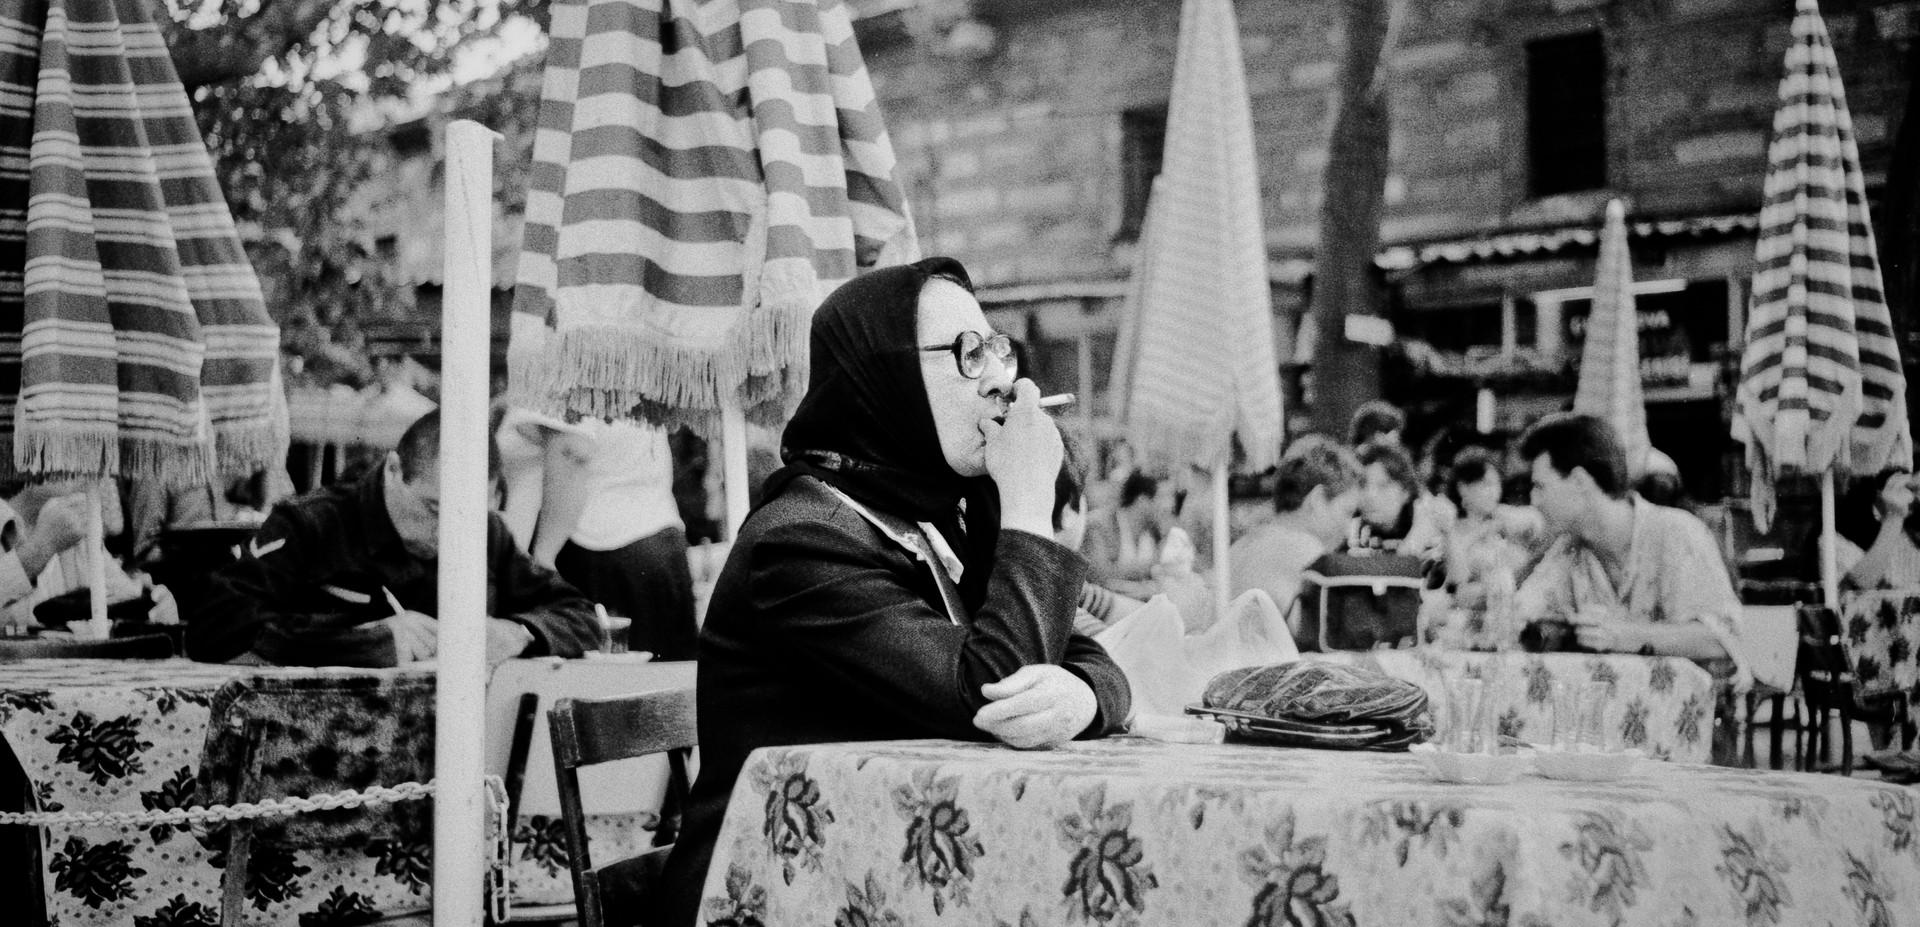 Istanbul, Turkey 1986